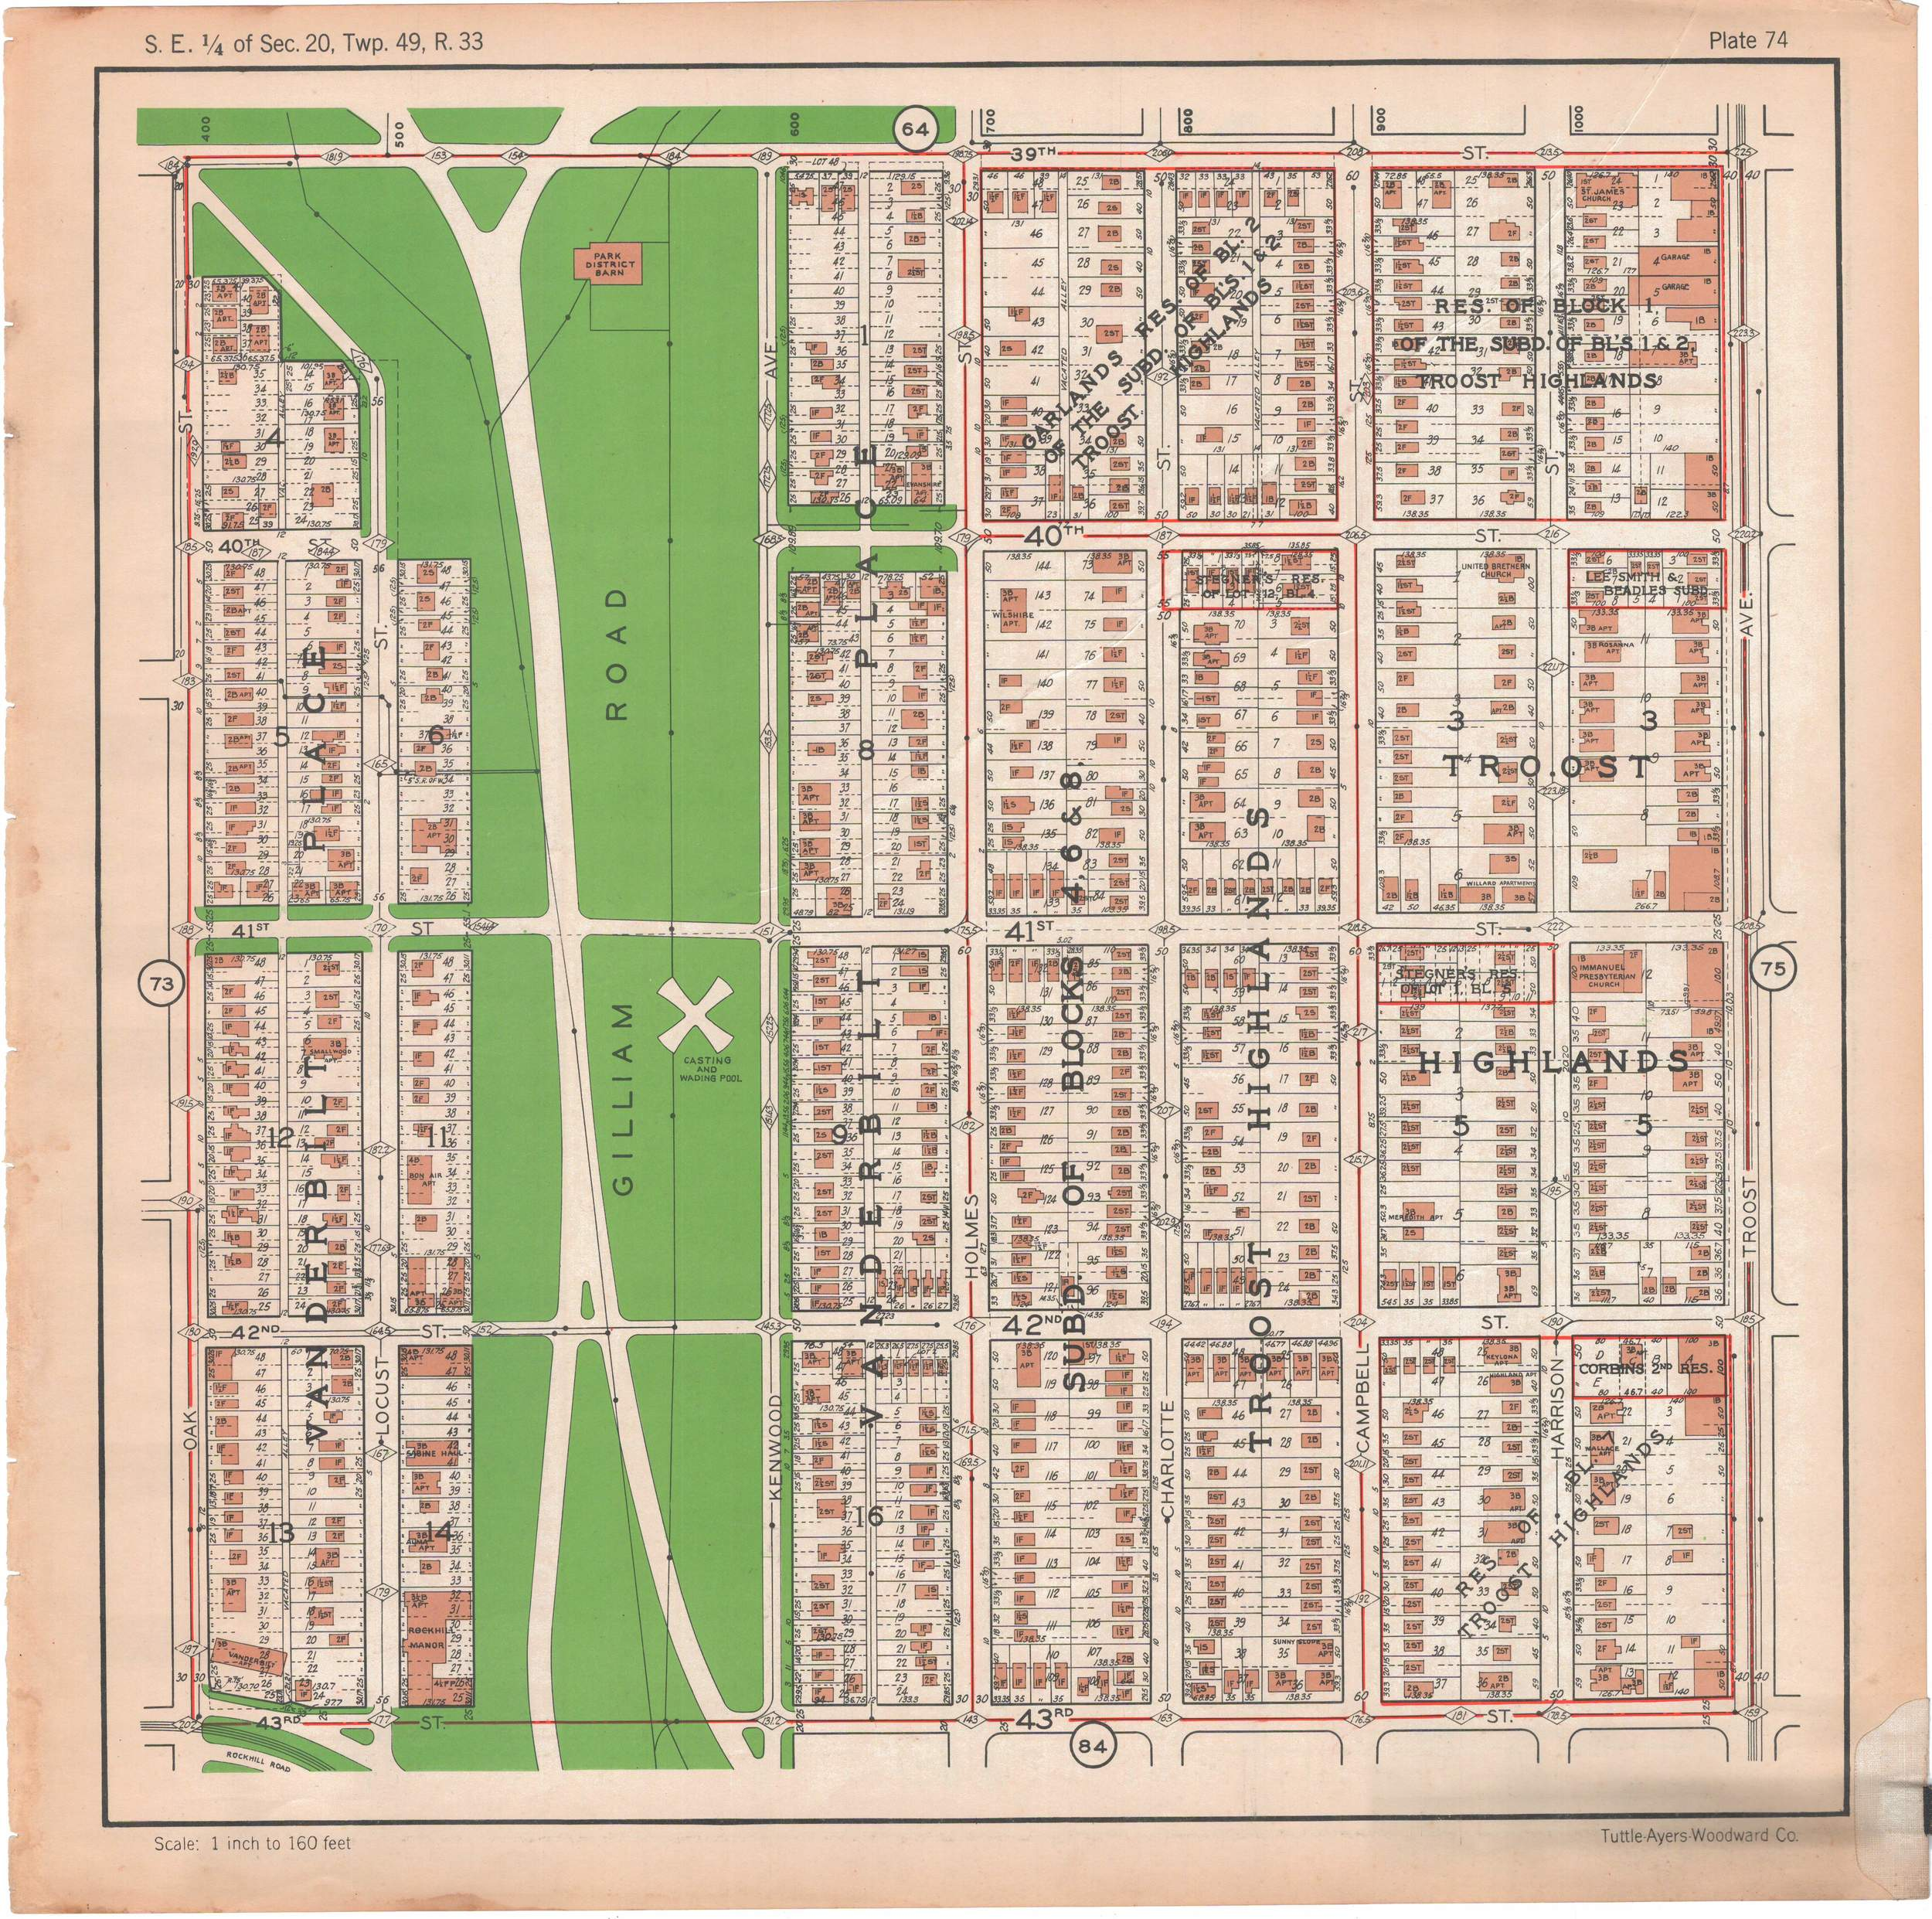 1925 TUTTLE_AYERS_Plate 74.JPG